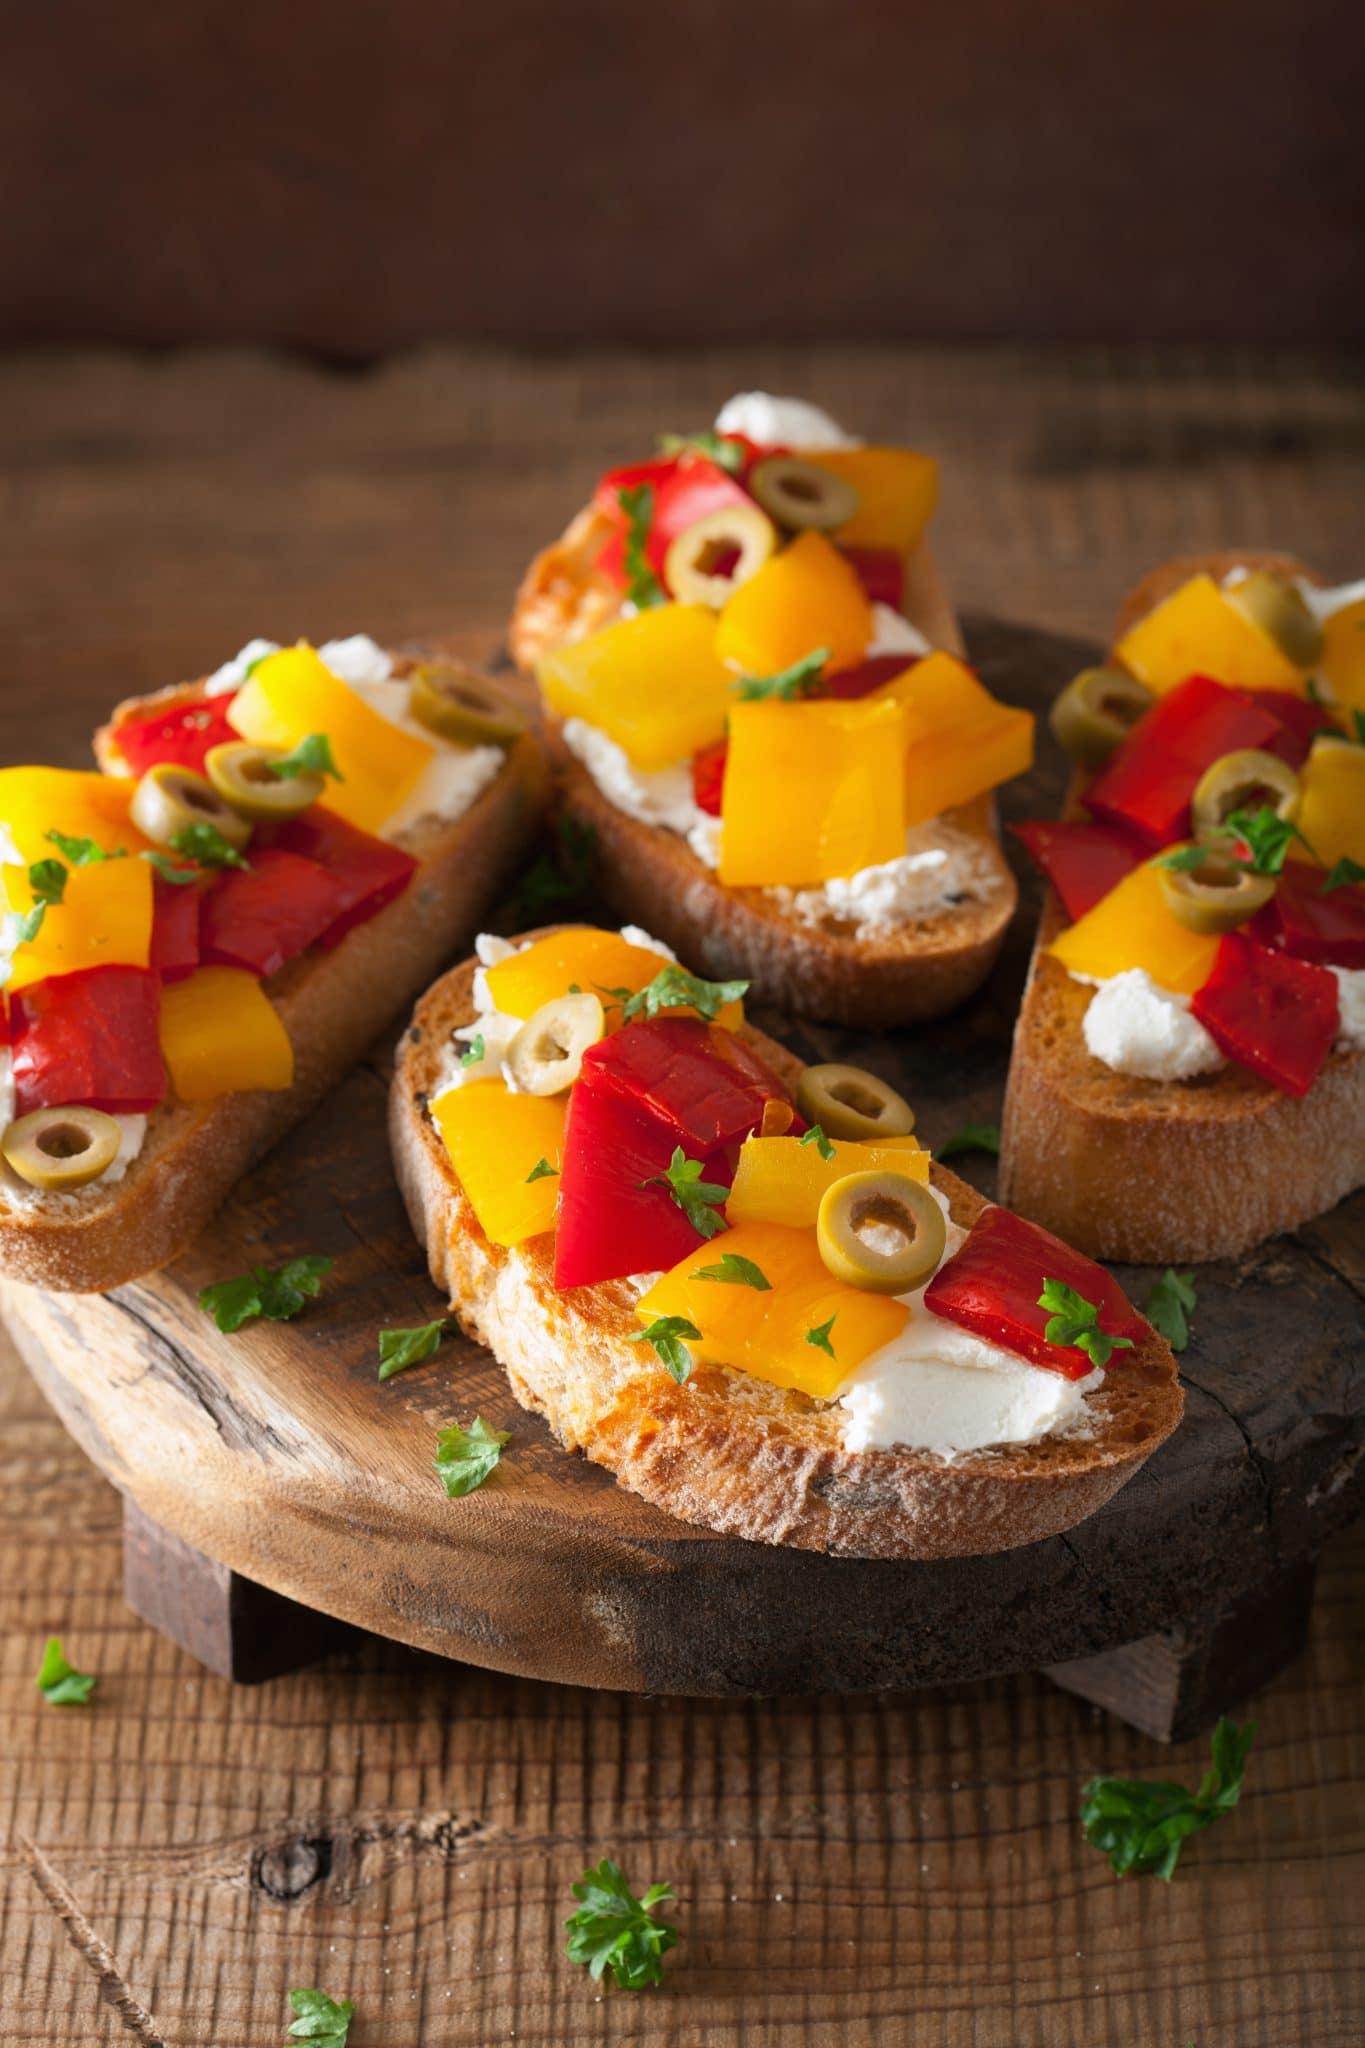 italian-bruschetta-with-peppers-goat-cheese-PHMHR7U